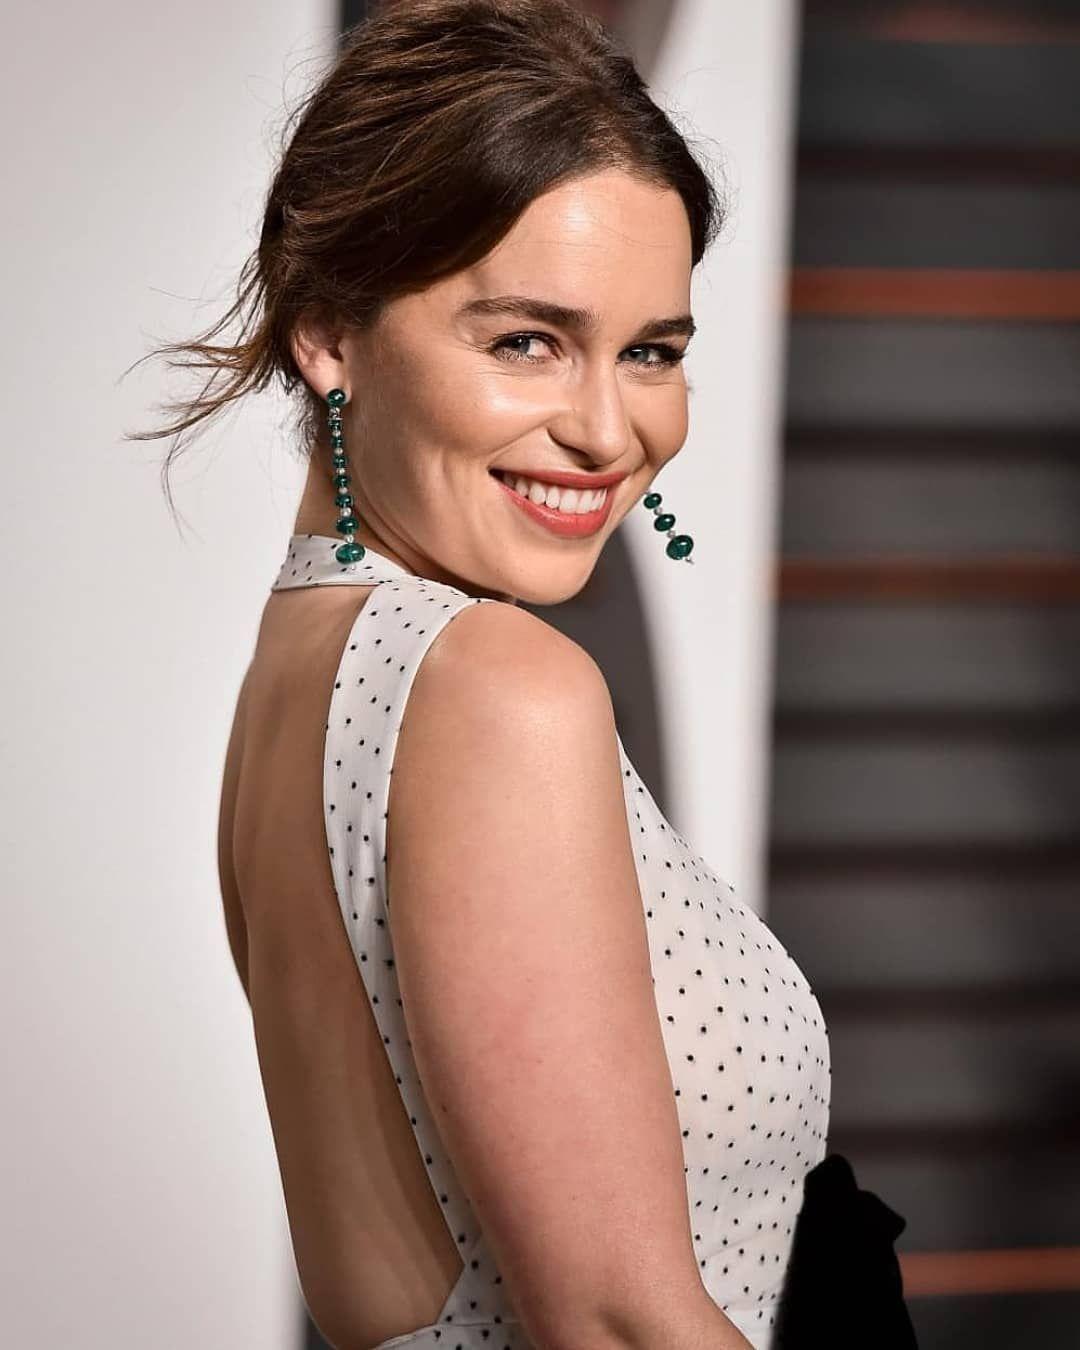 Emilia Clarke | Emilia clarke bikini, Emilia clarke ...